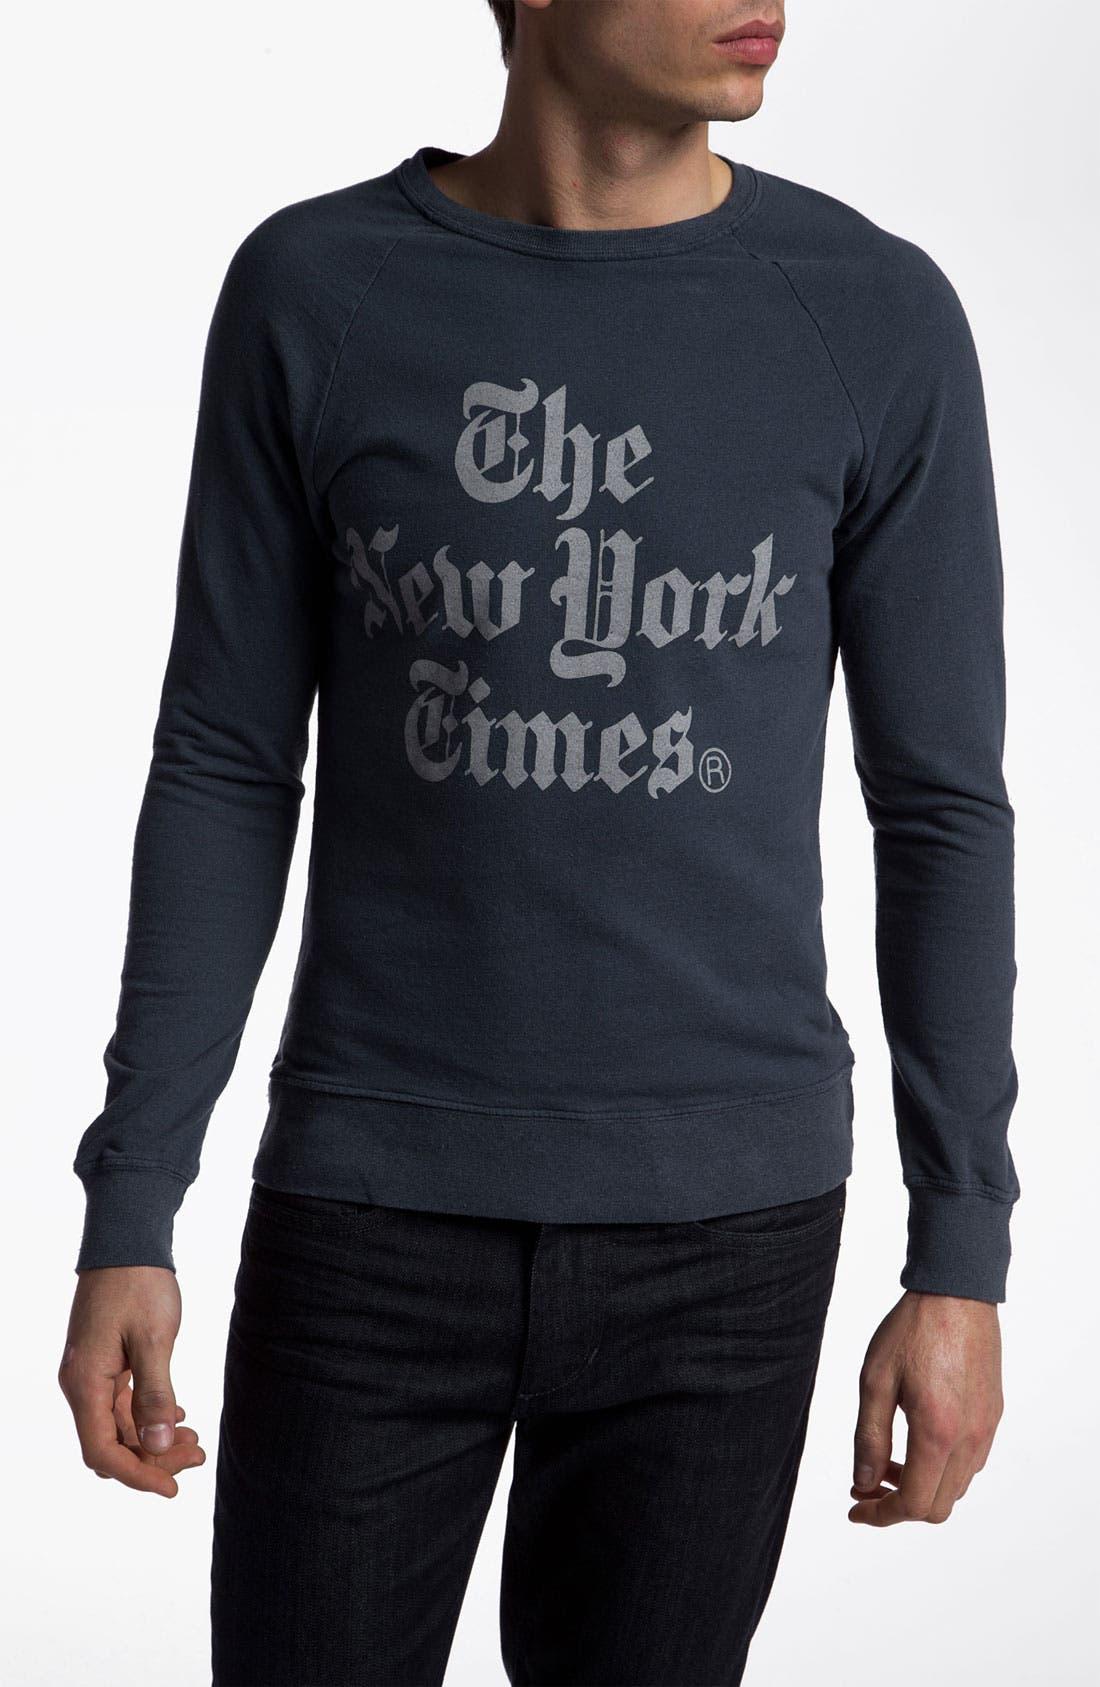 Alternate Image 1 Selected - Altru 'The New York Times®' Graphic Crewneck Sweatshirt